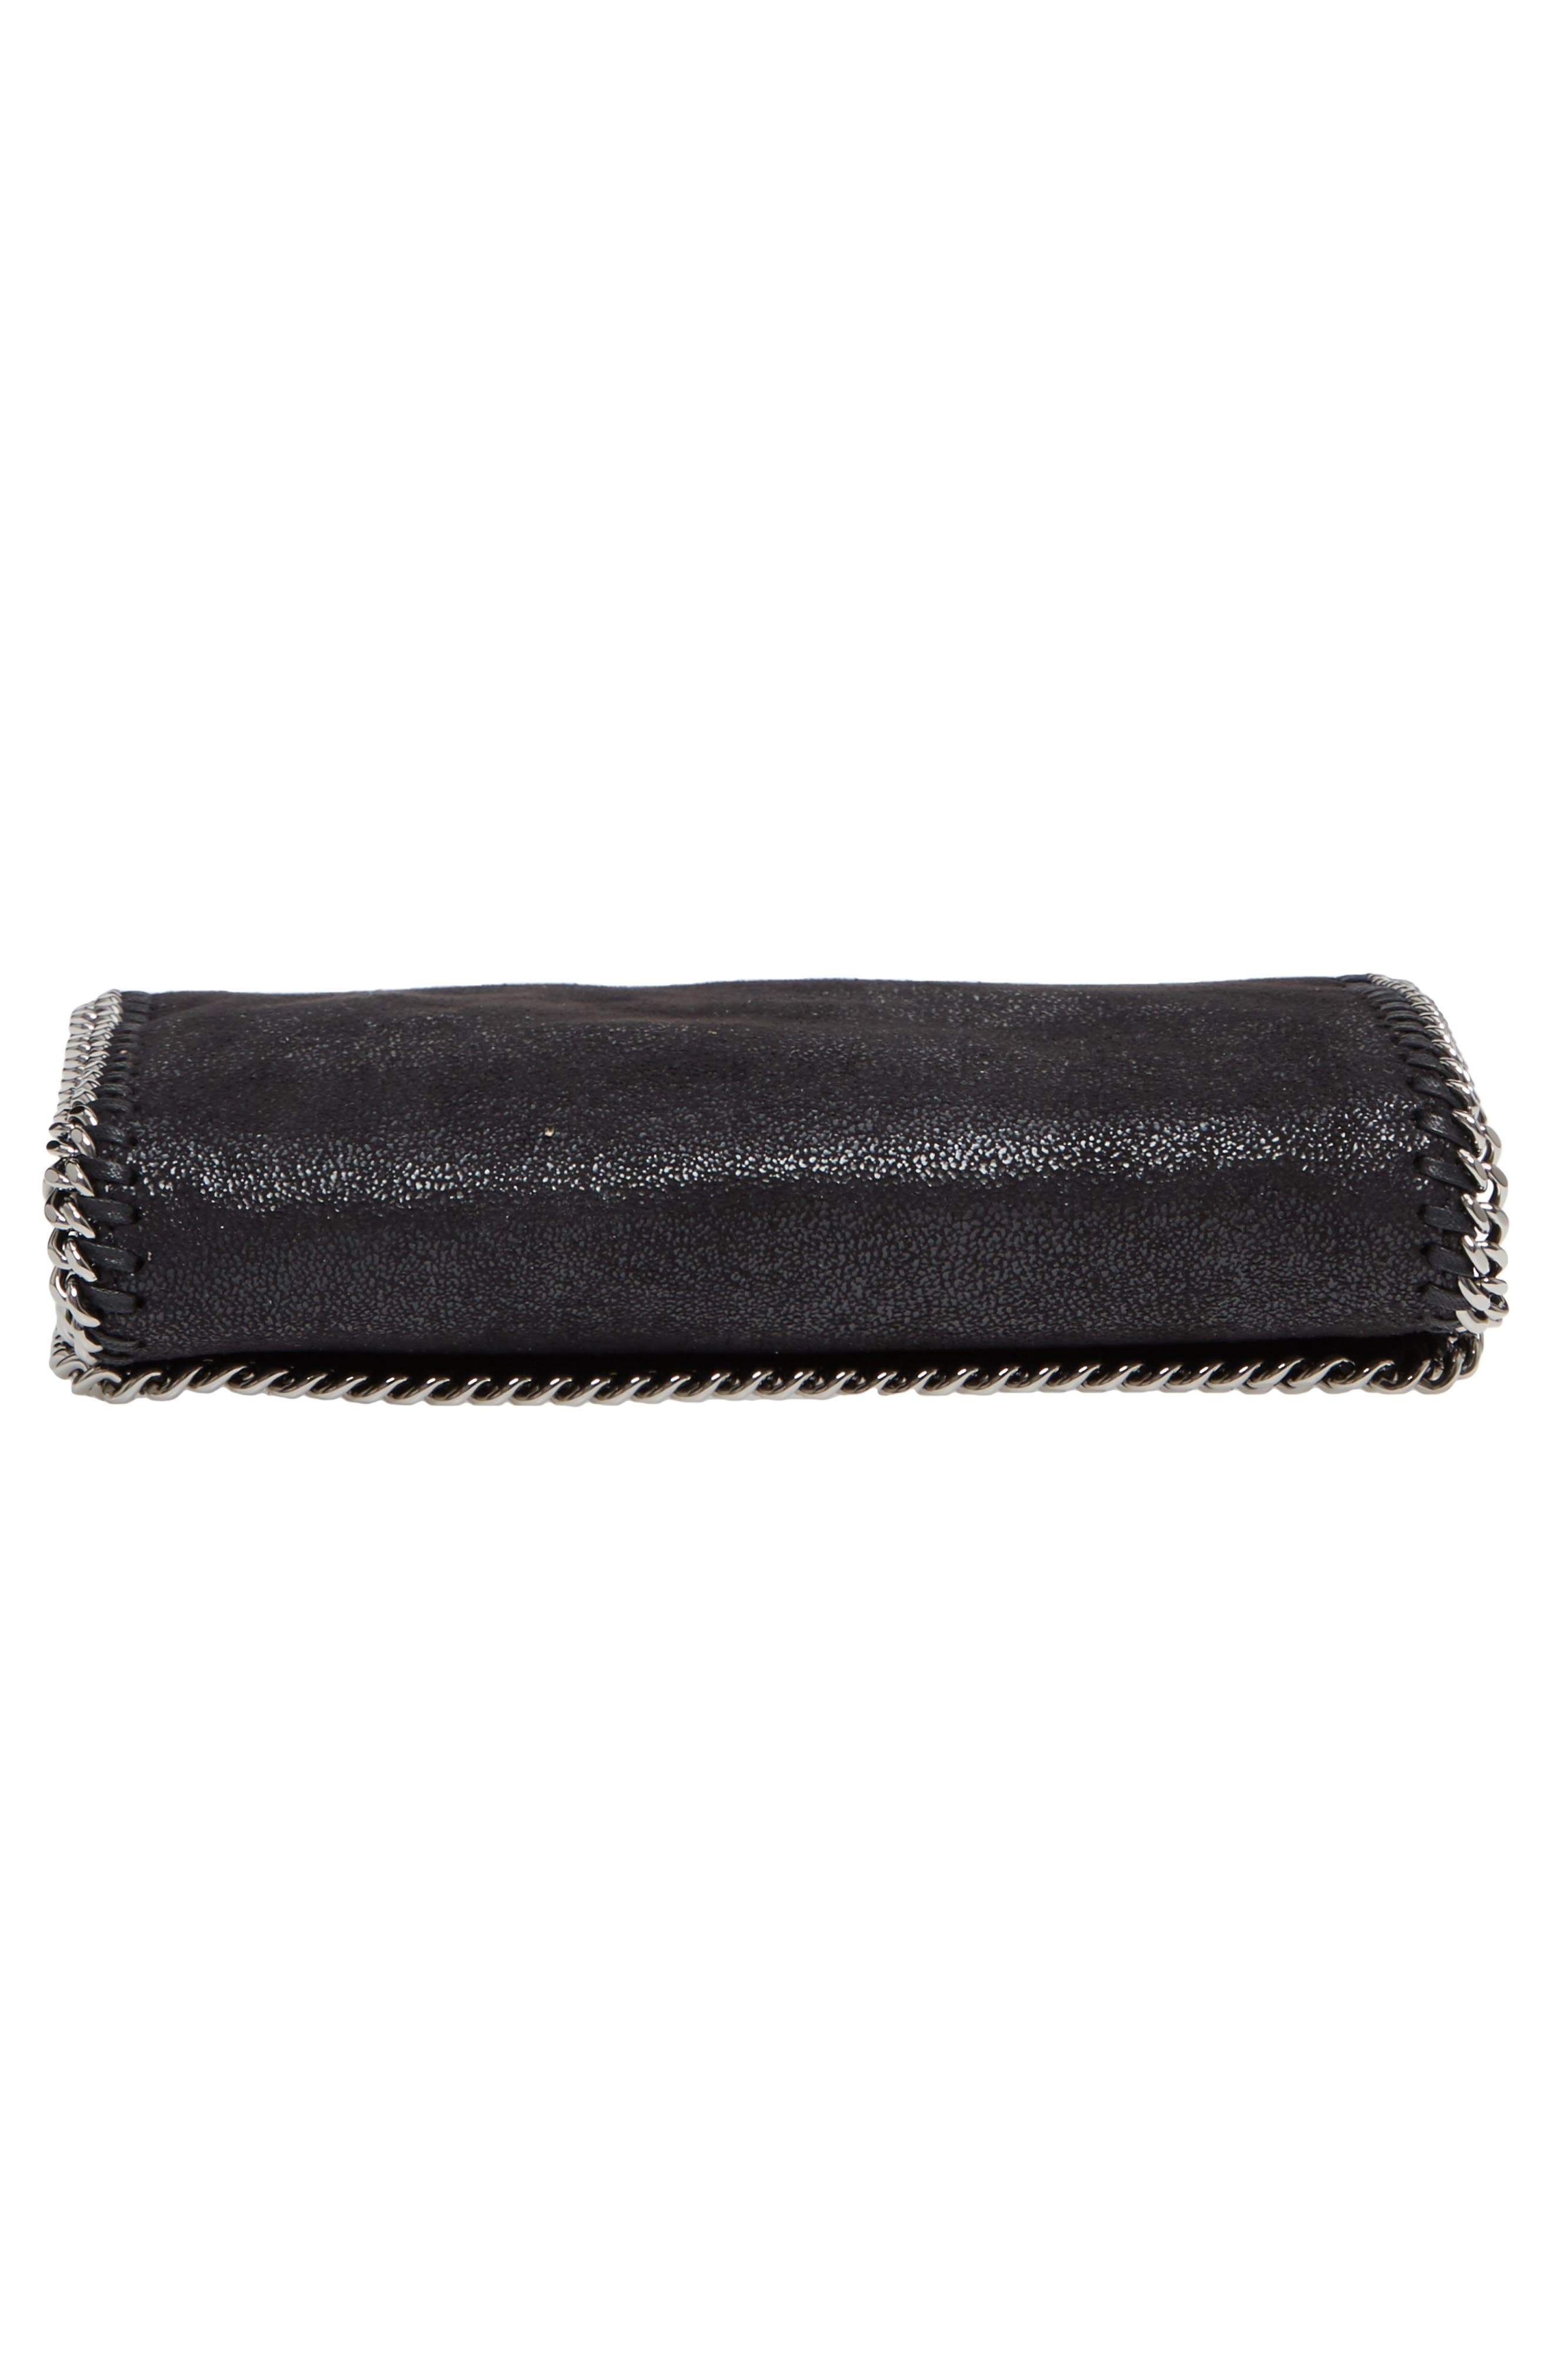 'Falabella - Shaggy Deer' Faux Leather Crossbody Bag,                             Alternate thumbnail 6, color,                             BLACK SLVR HRDWR